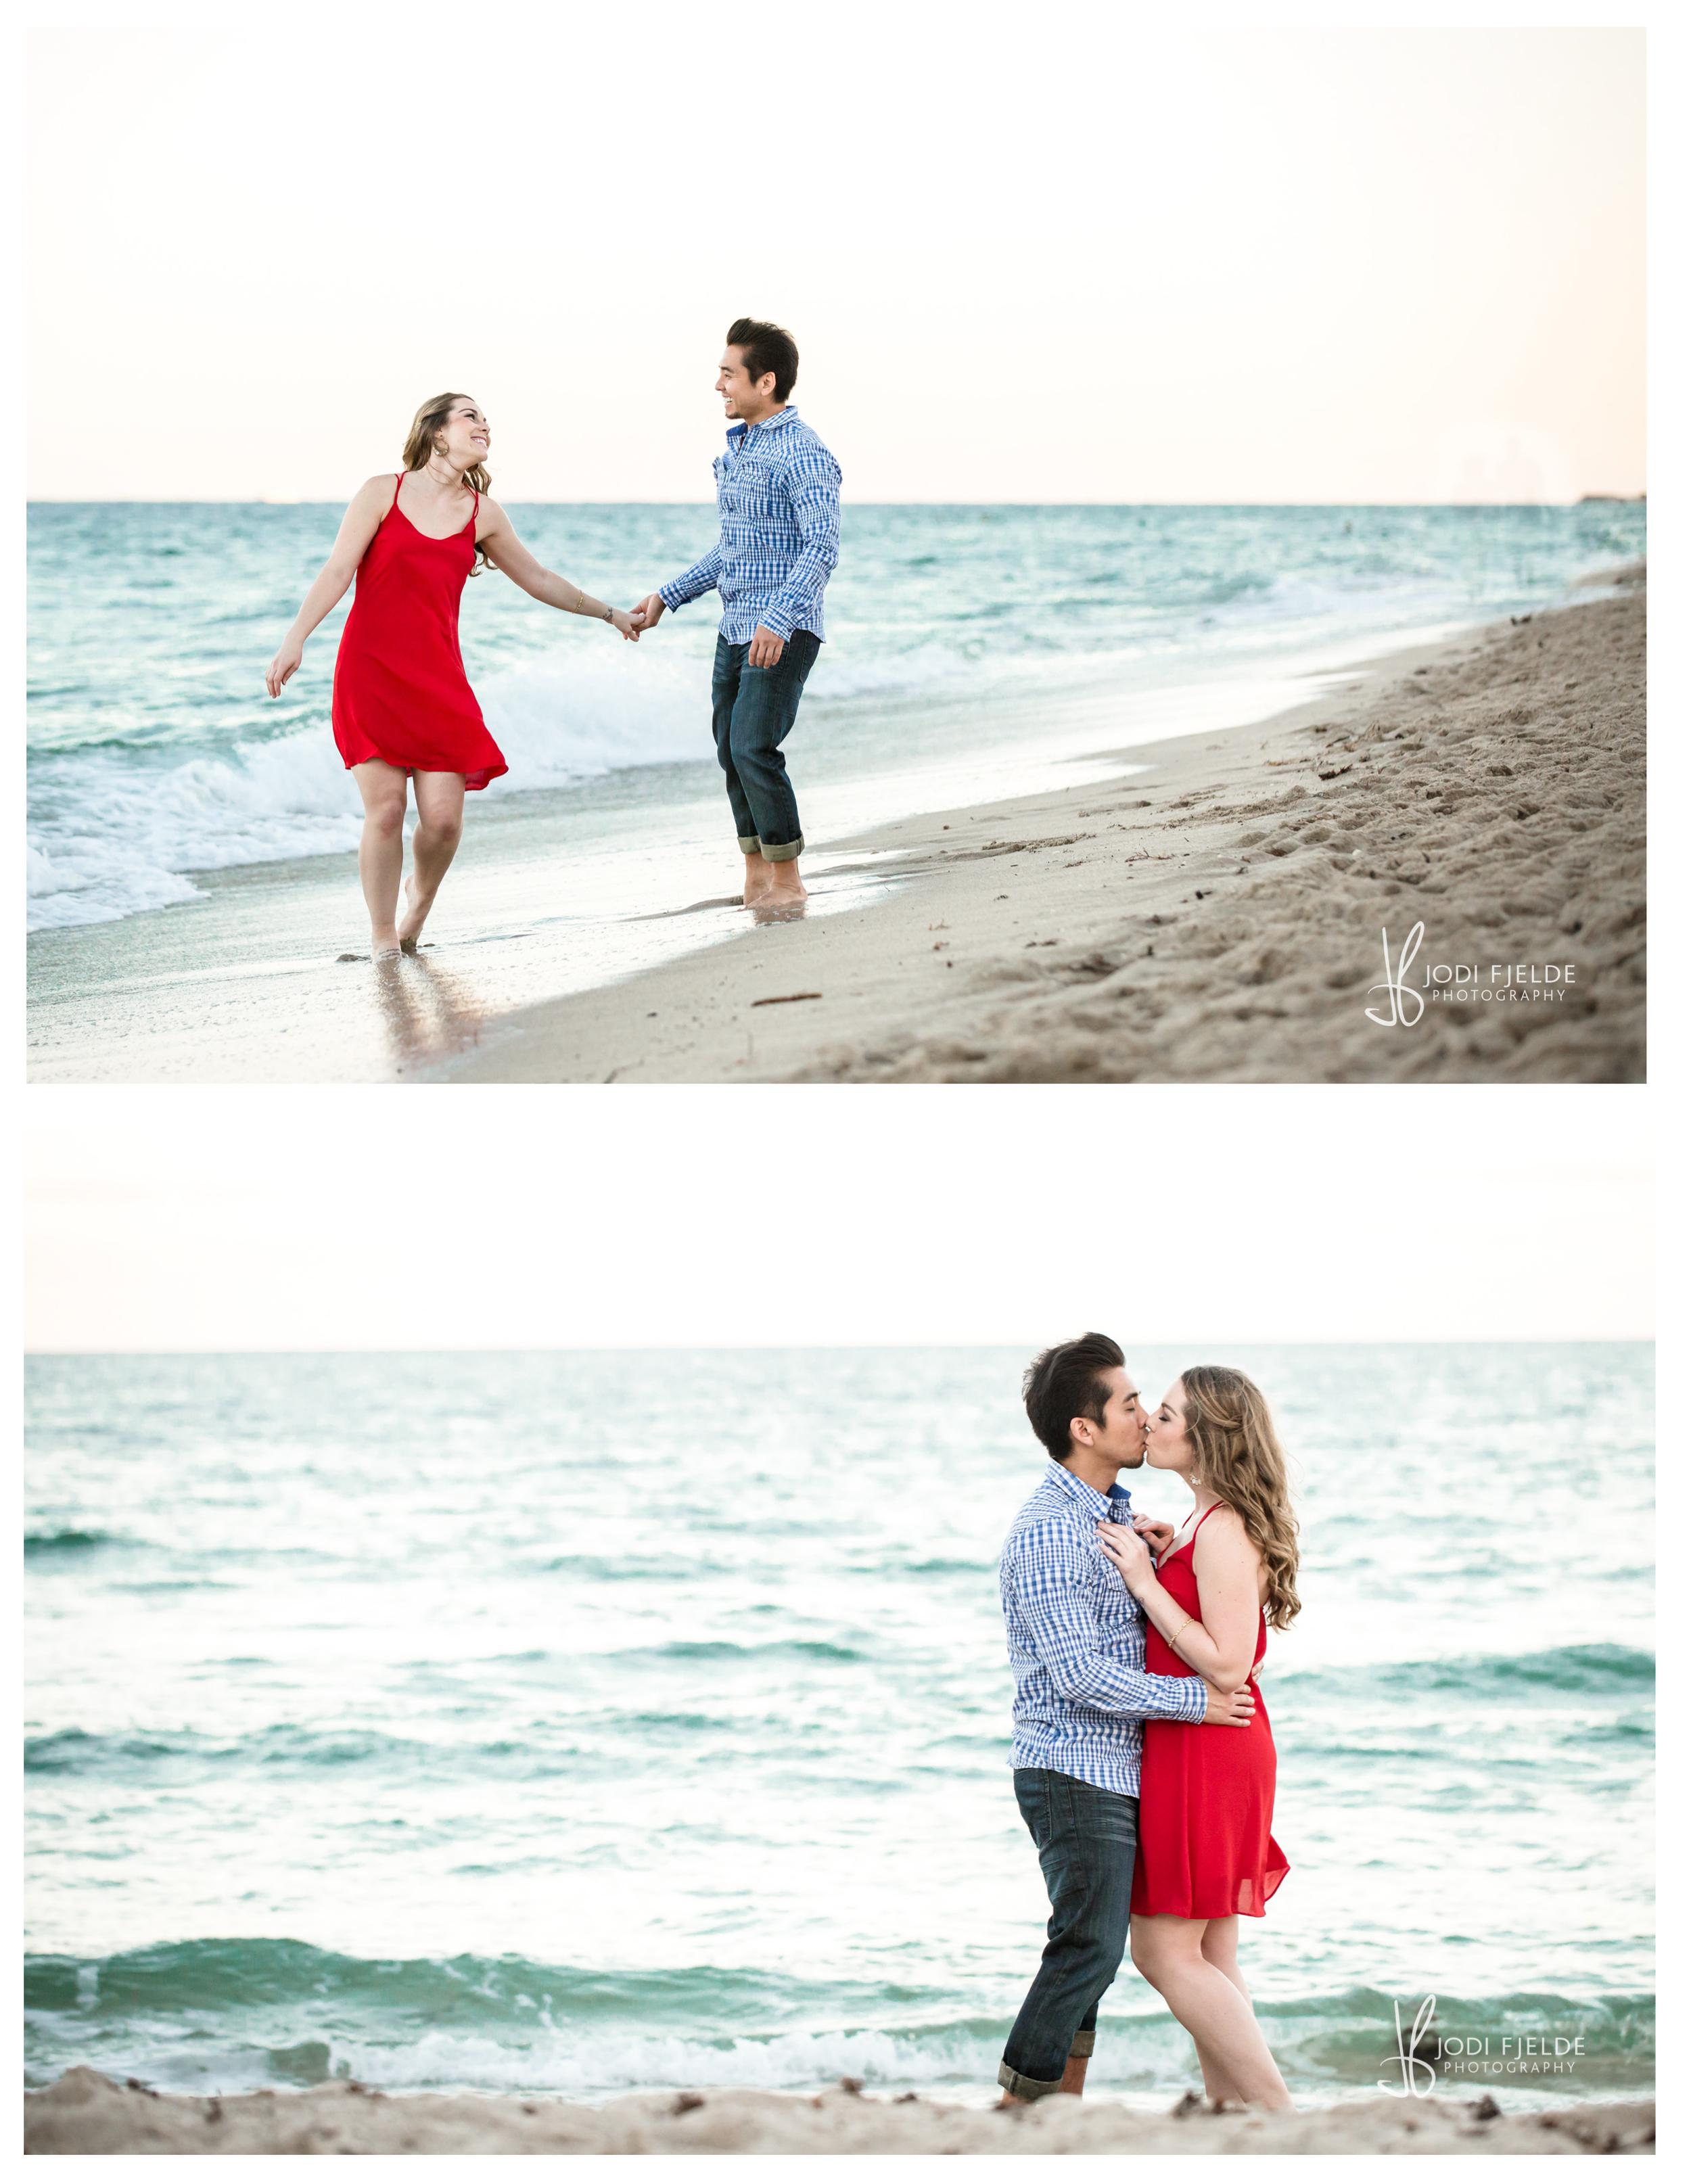 Fort_Lauderdale_engagement_session_Kelsey_Ken_Jodi_Fjelde_Photography_6.jpg